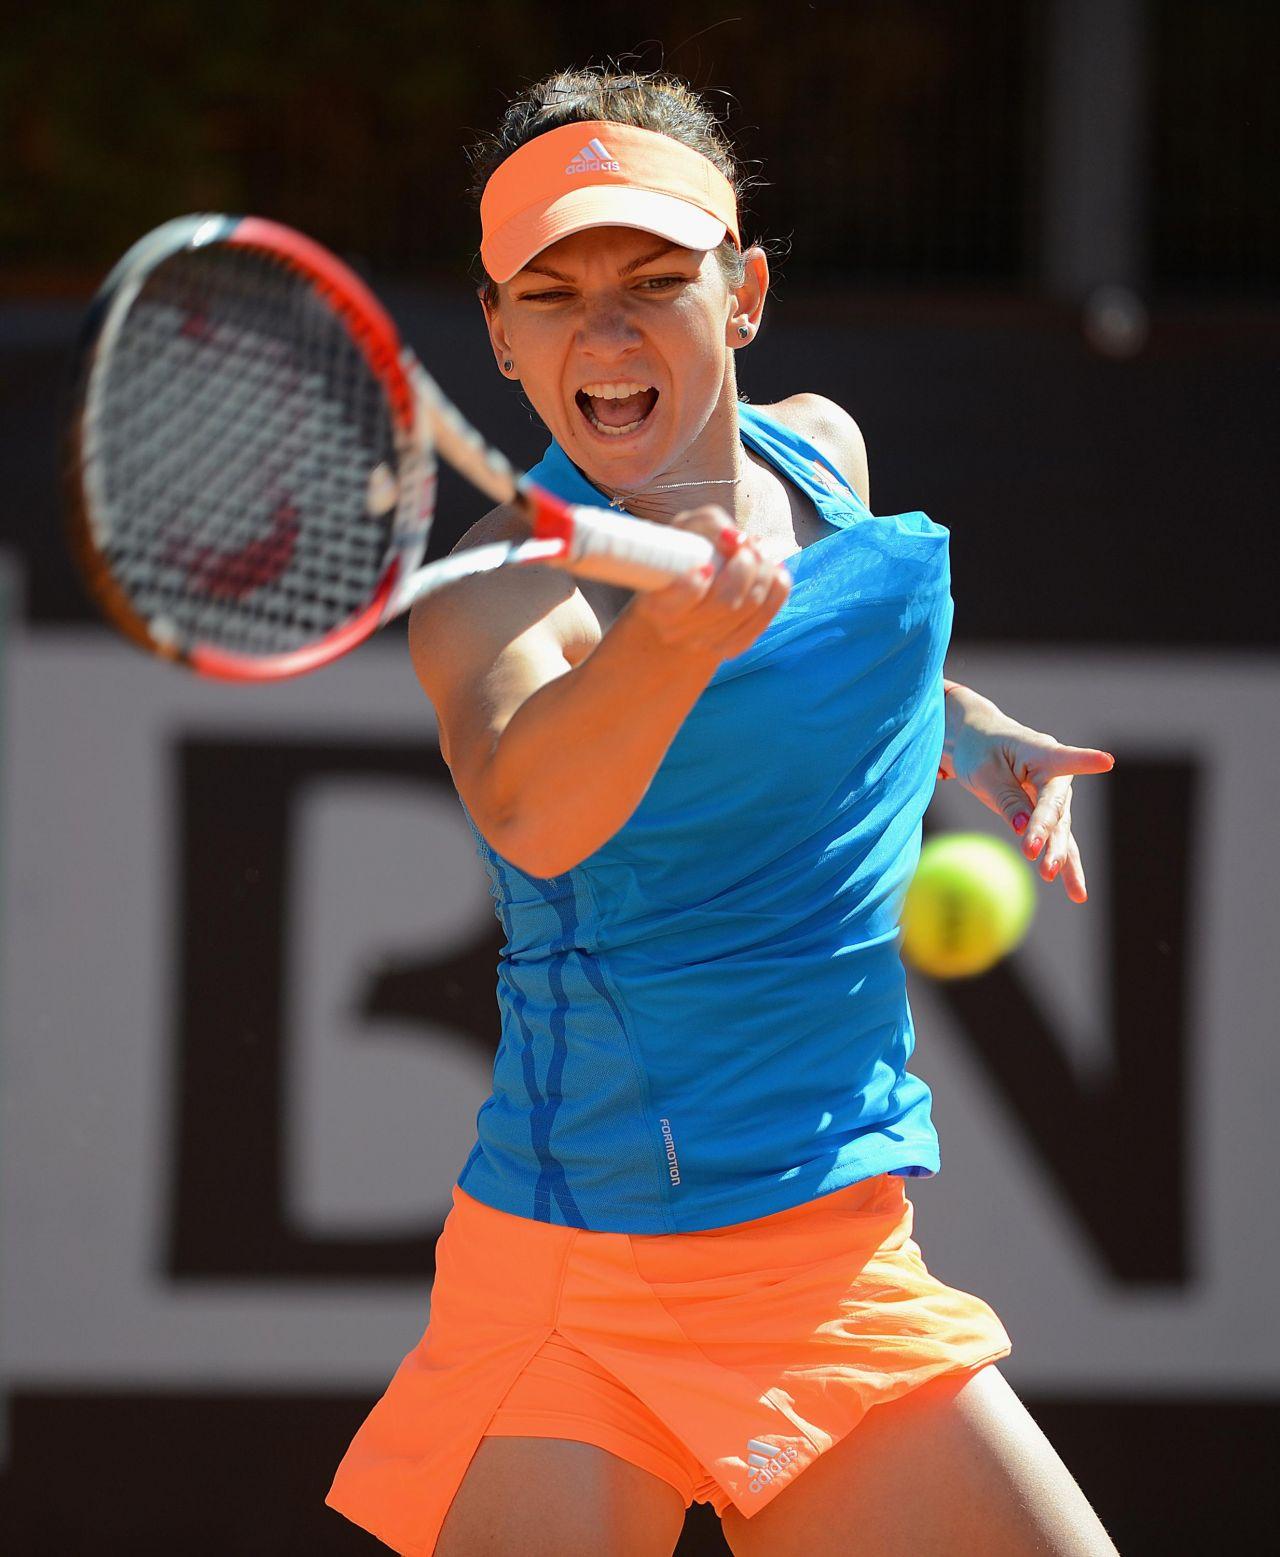 rome open tennis 2014 schedule - photo#7